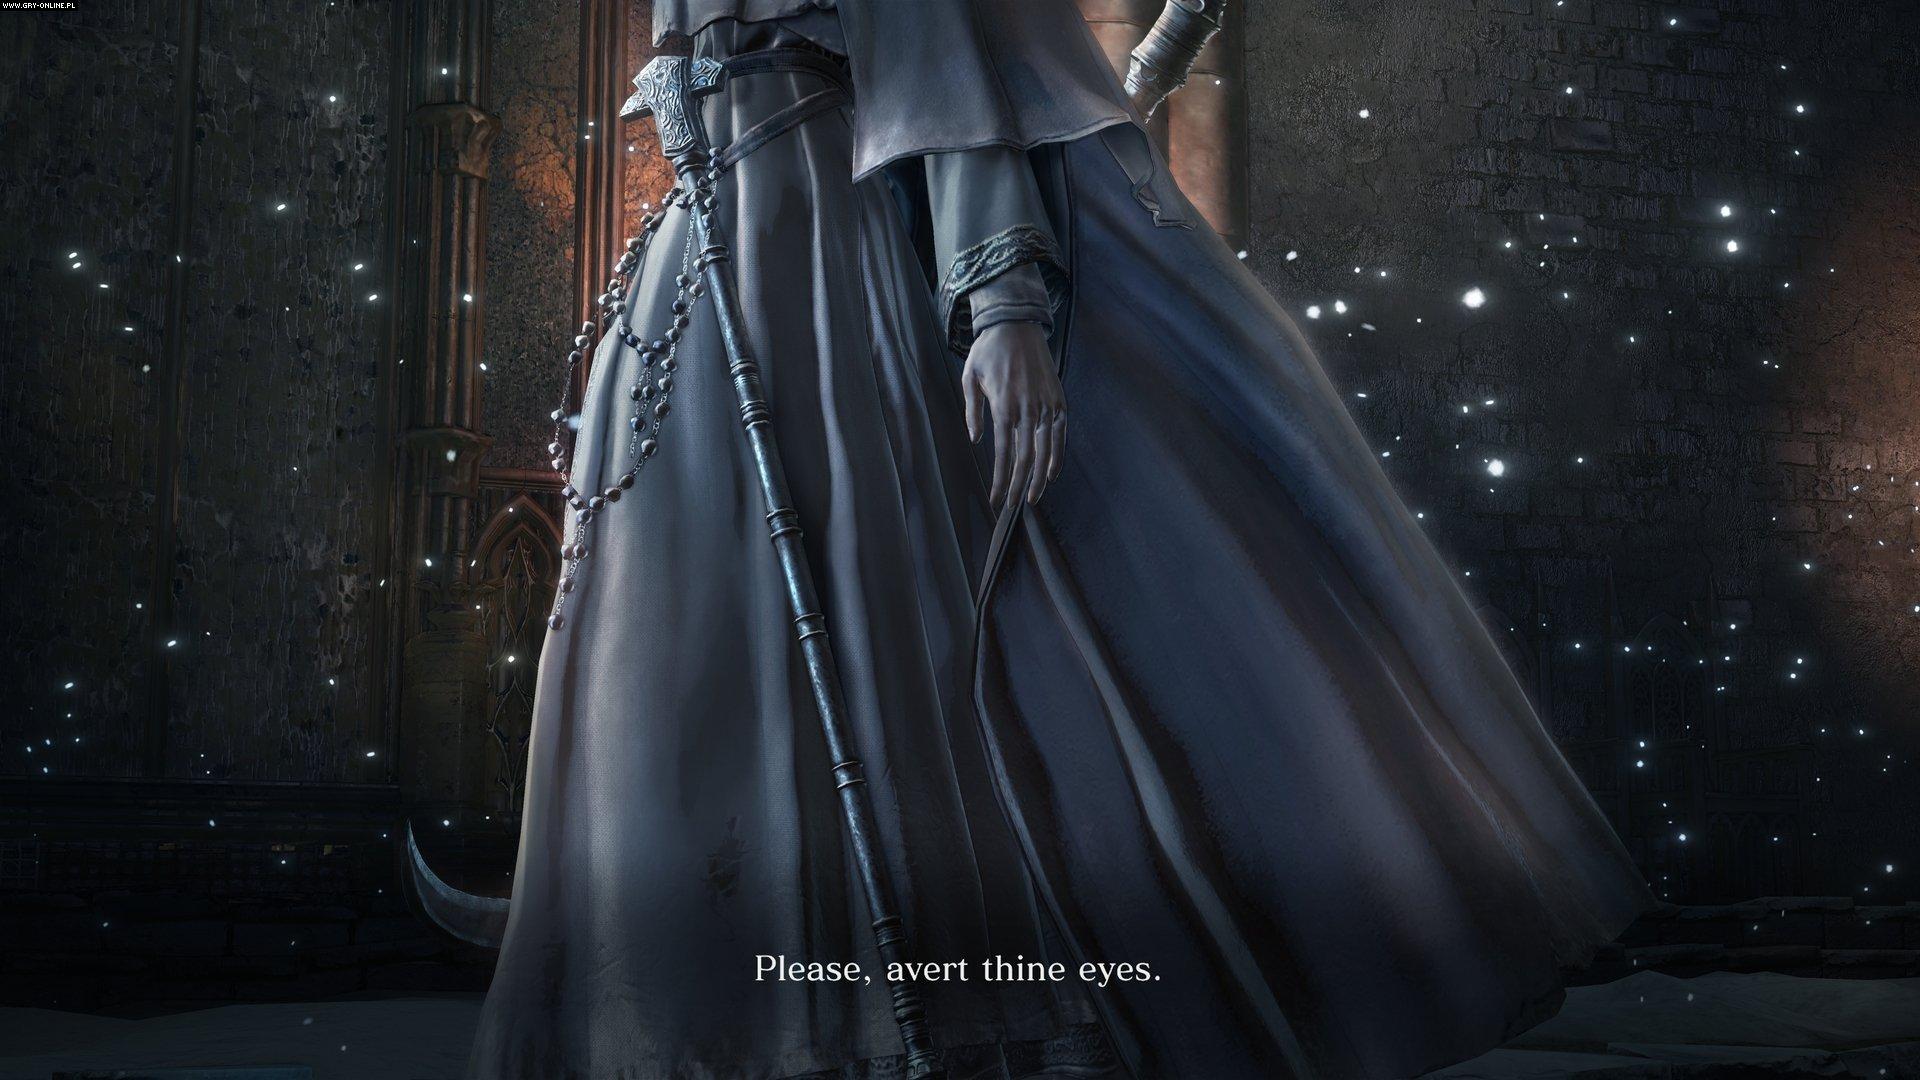 Dark Souls III: The Ringed City PC, PS4, XONE Games Image 36/36, FromSoftware, Bandai Namco Entertainment